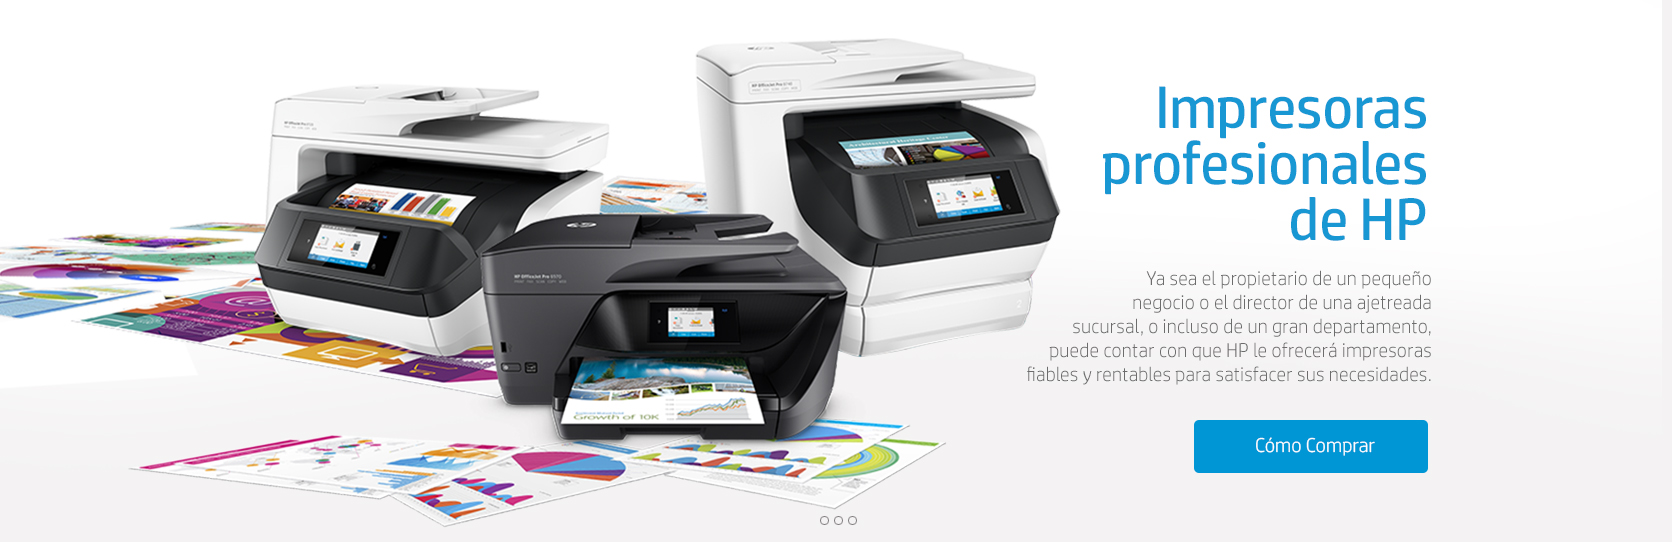 impresoras-profesionales-hp.jpg